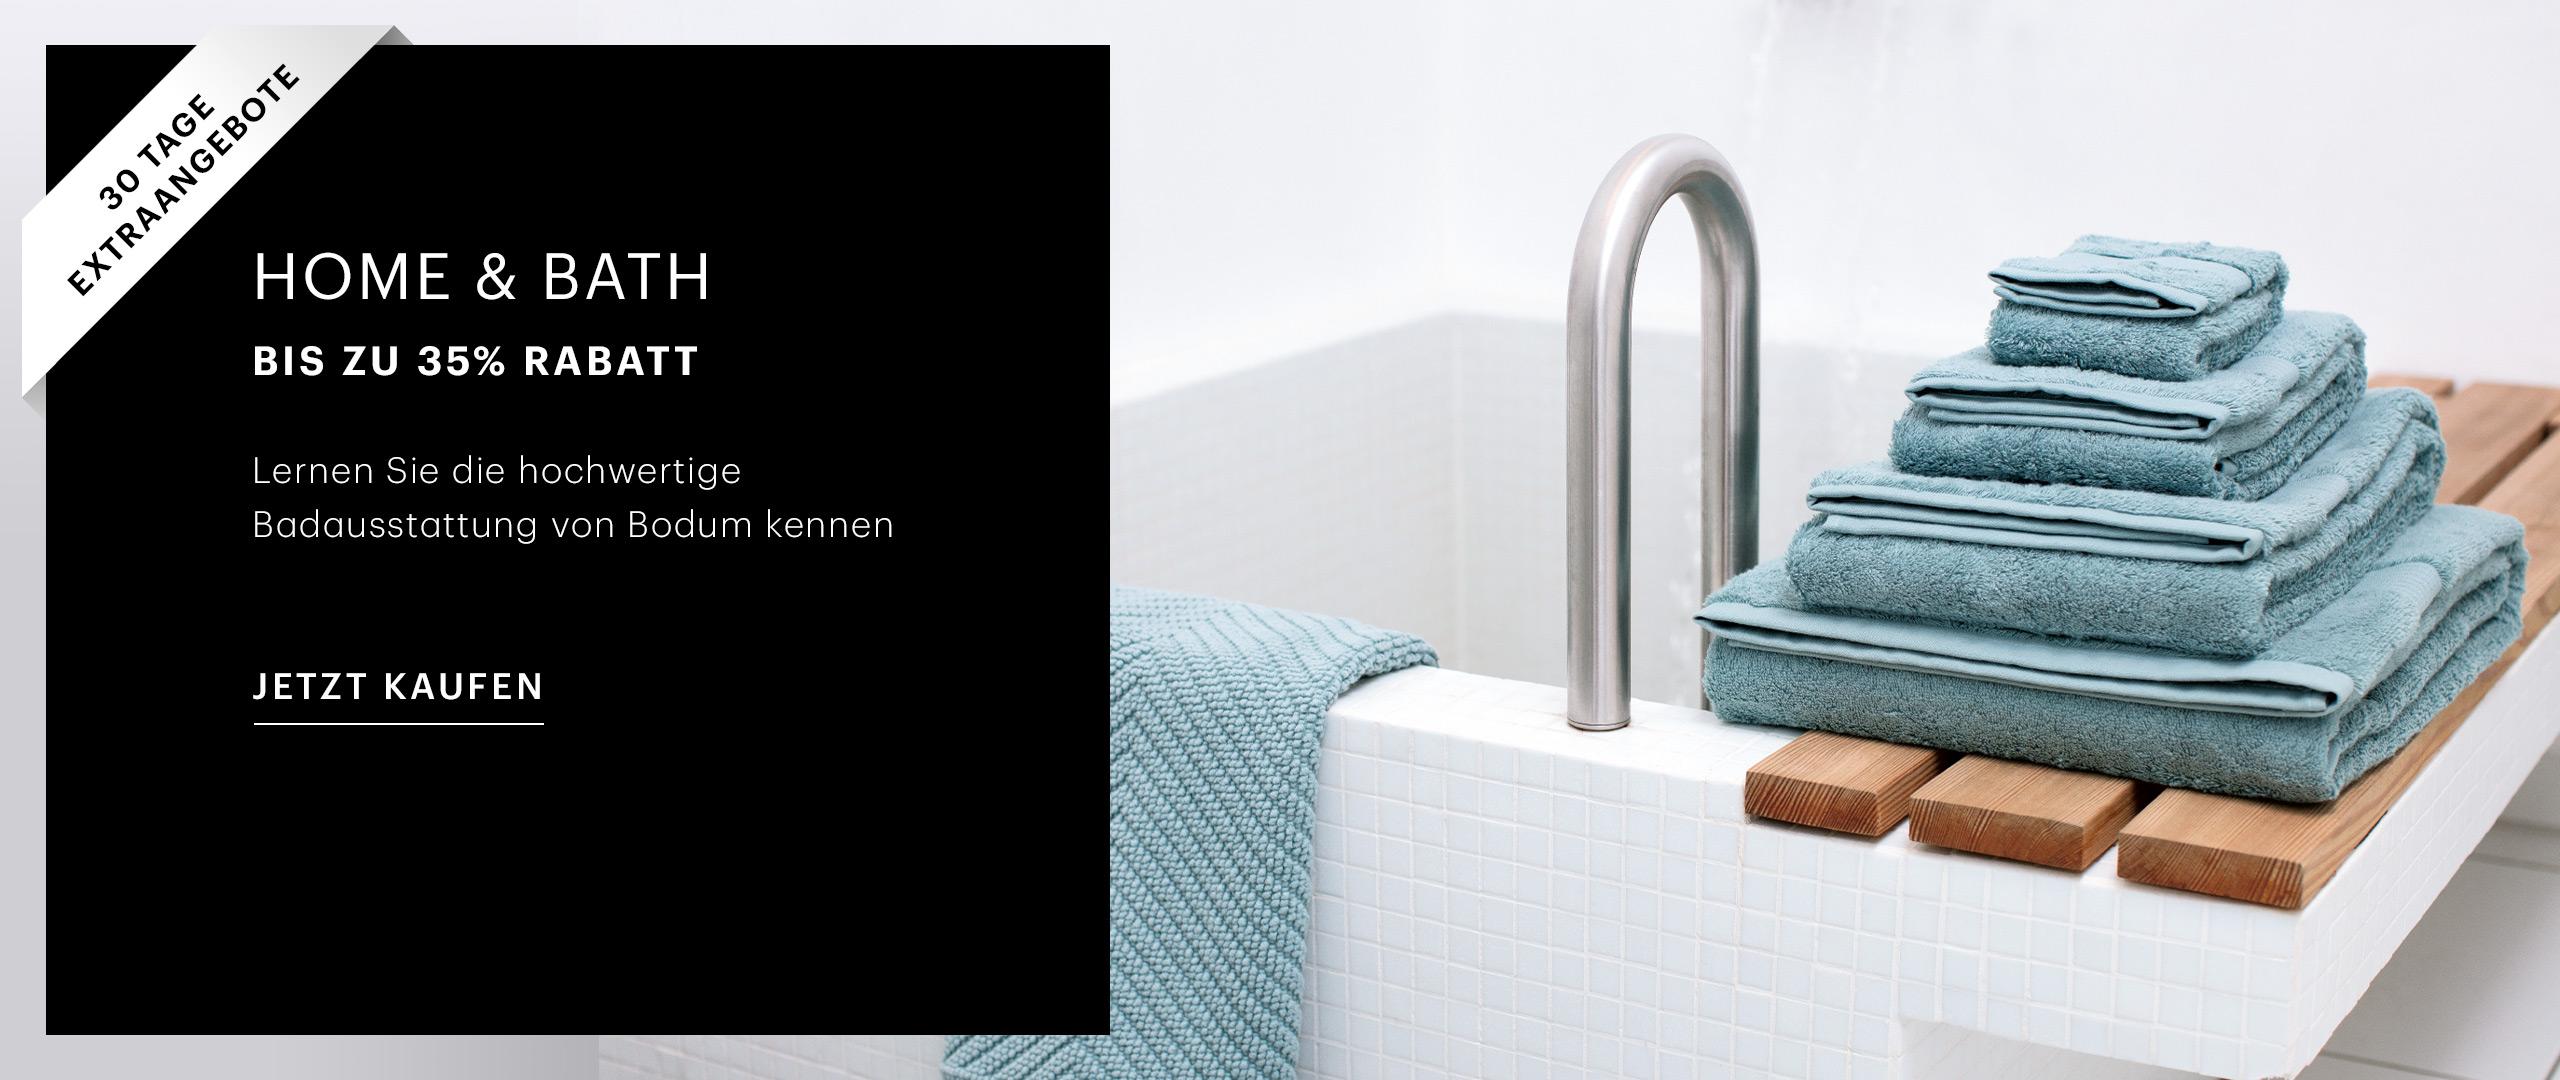 BEU [DE] - Home and Bath Specials